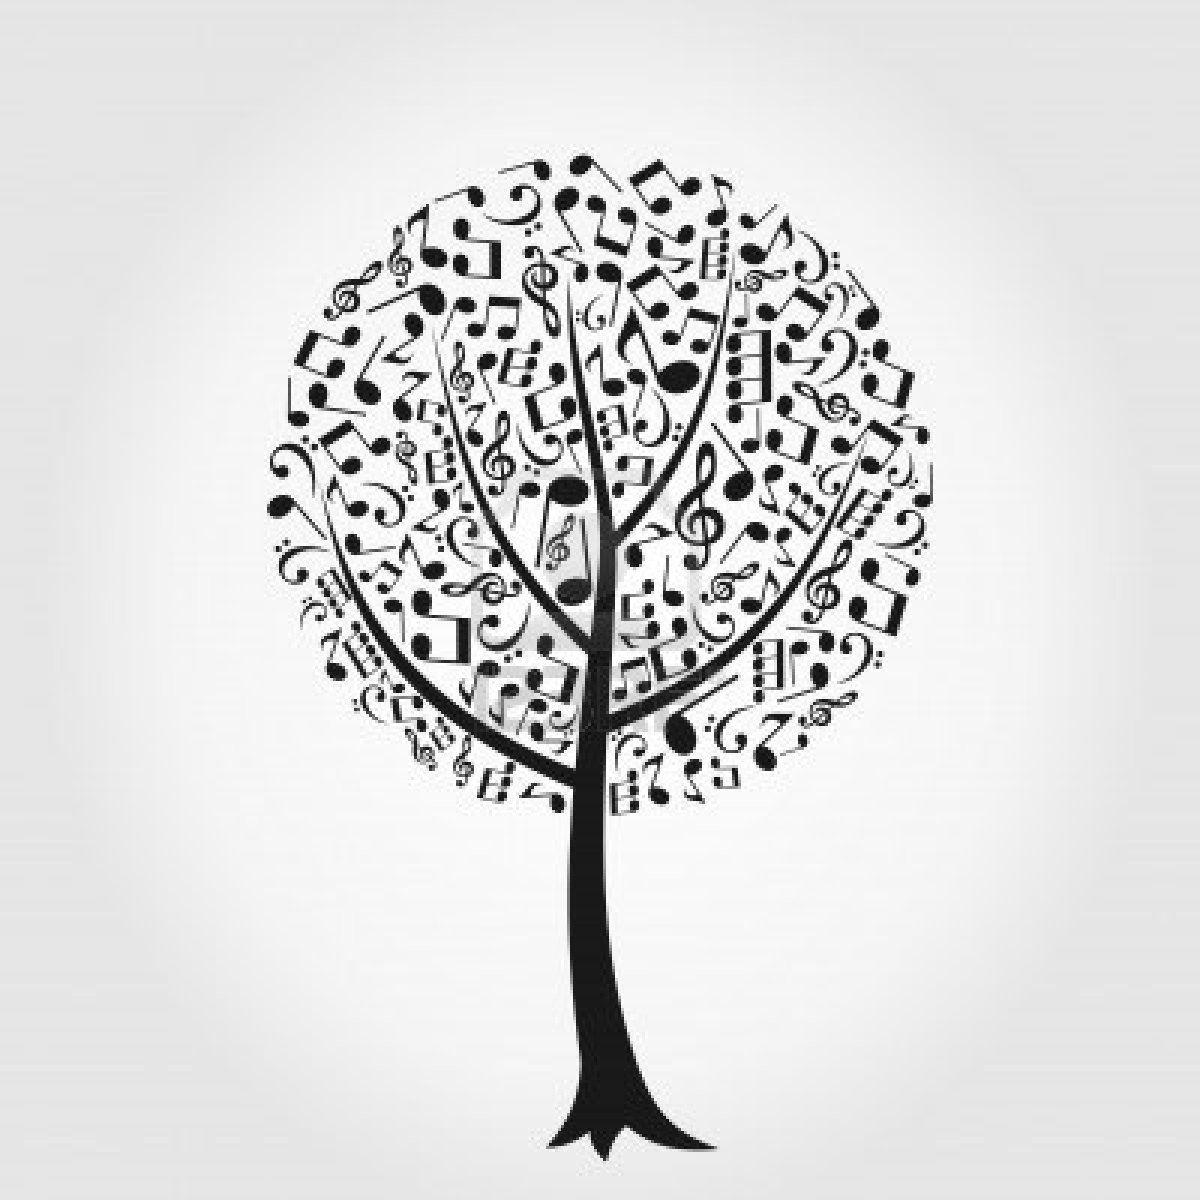 Abstract Art Music Tree